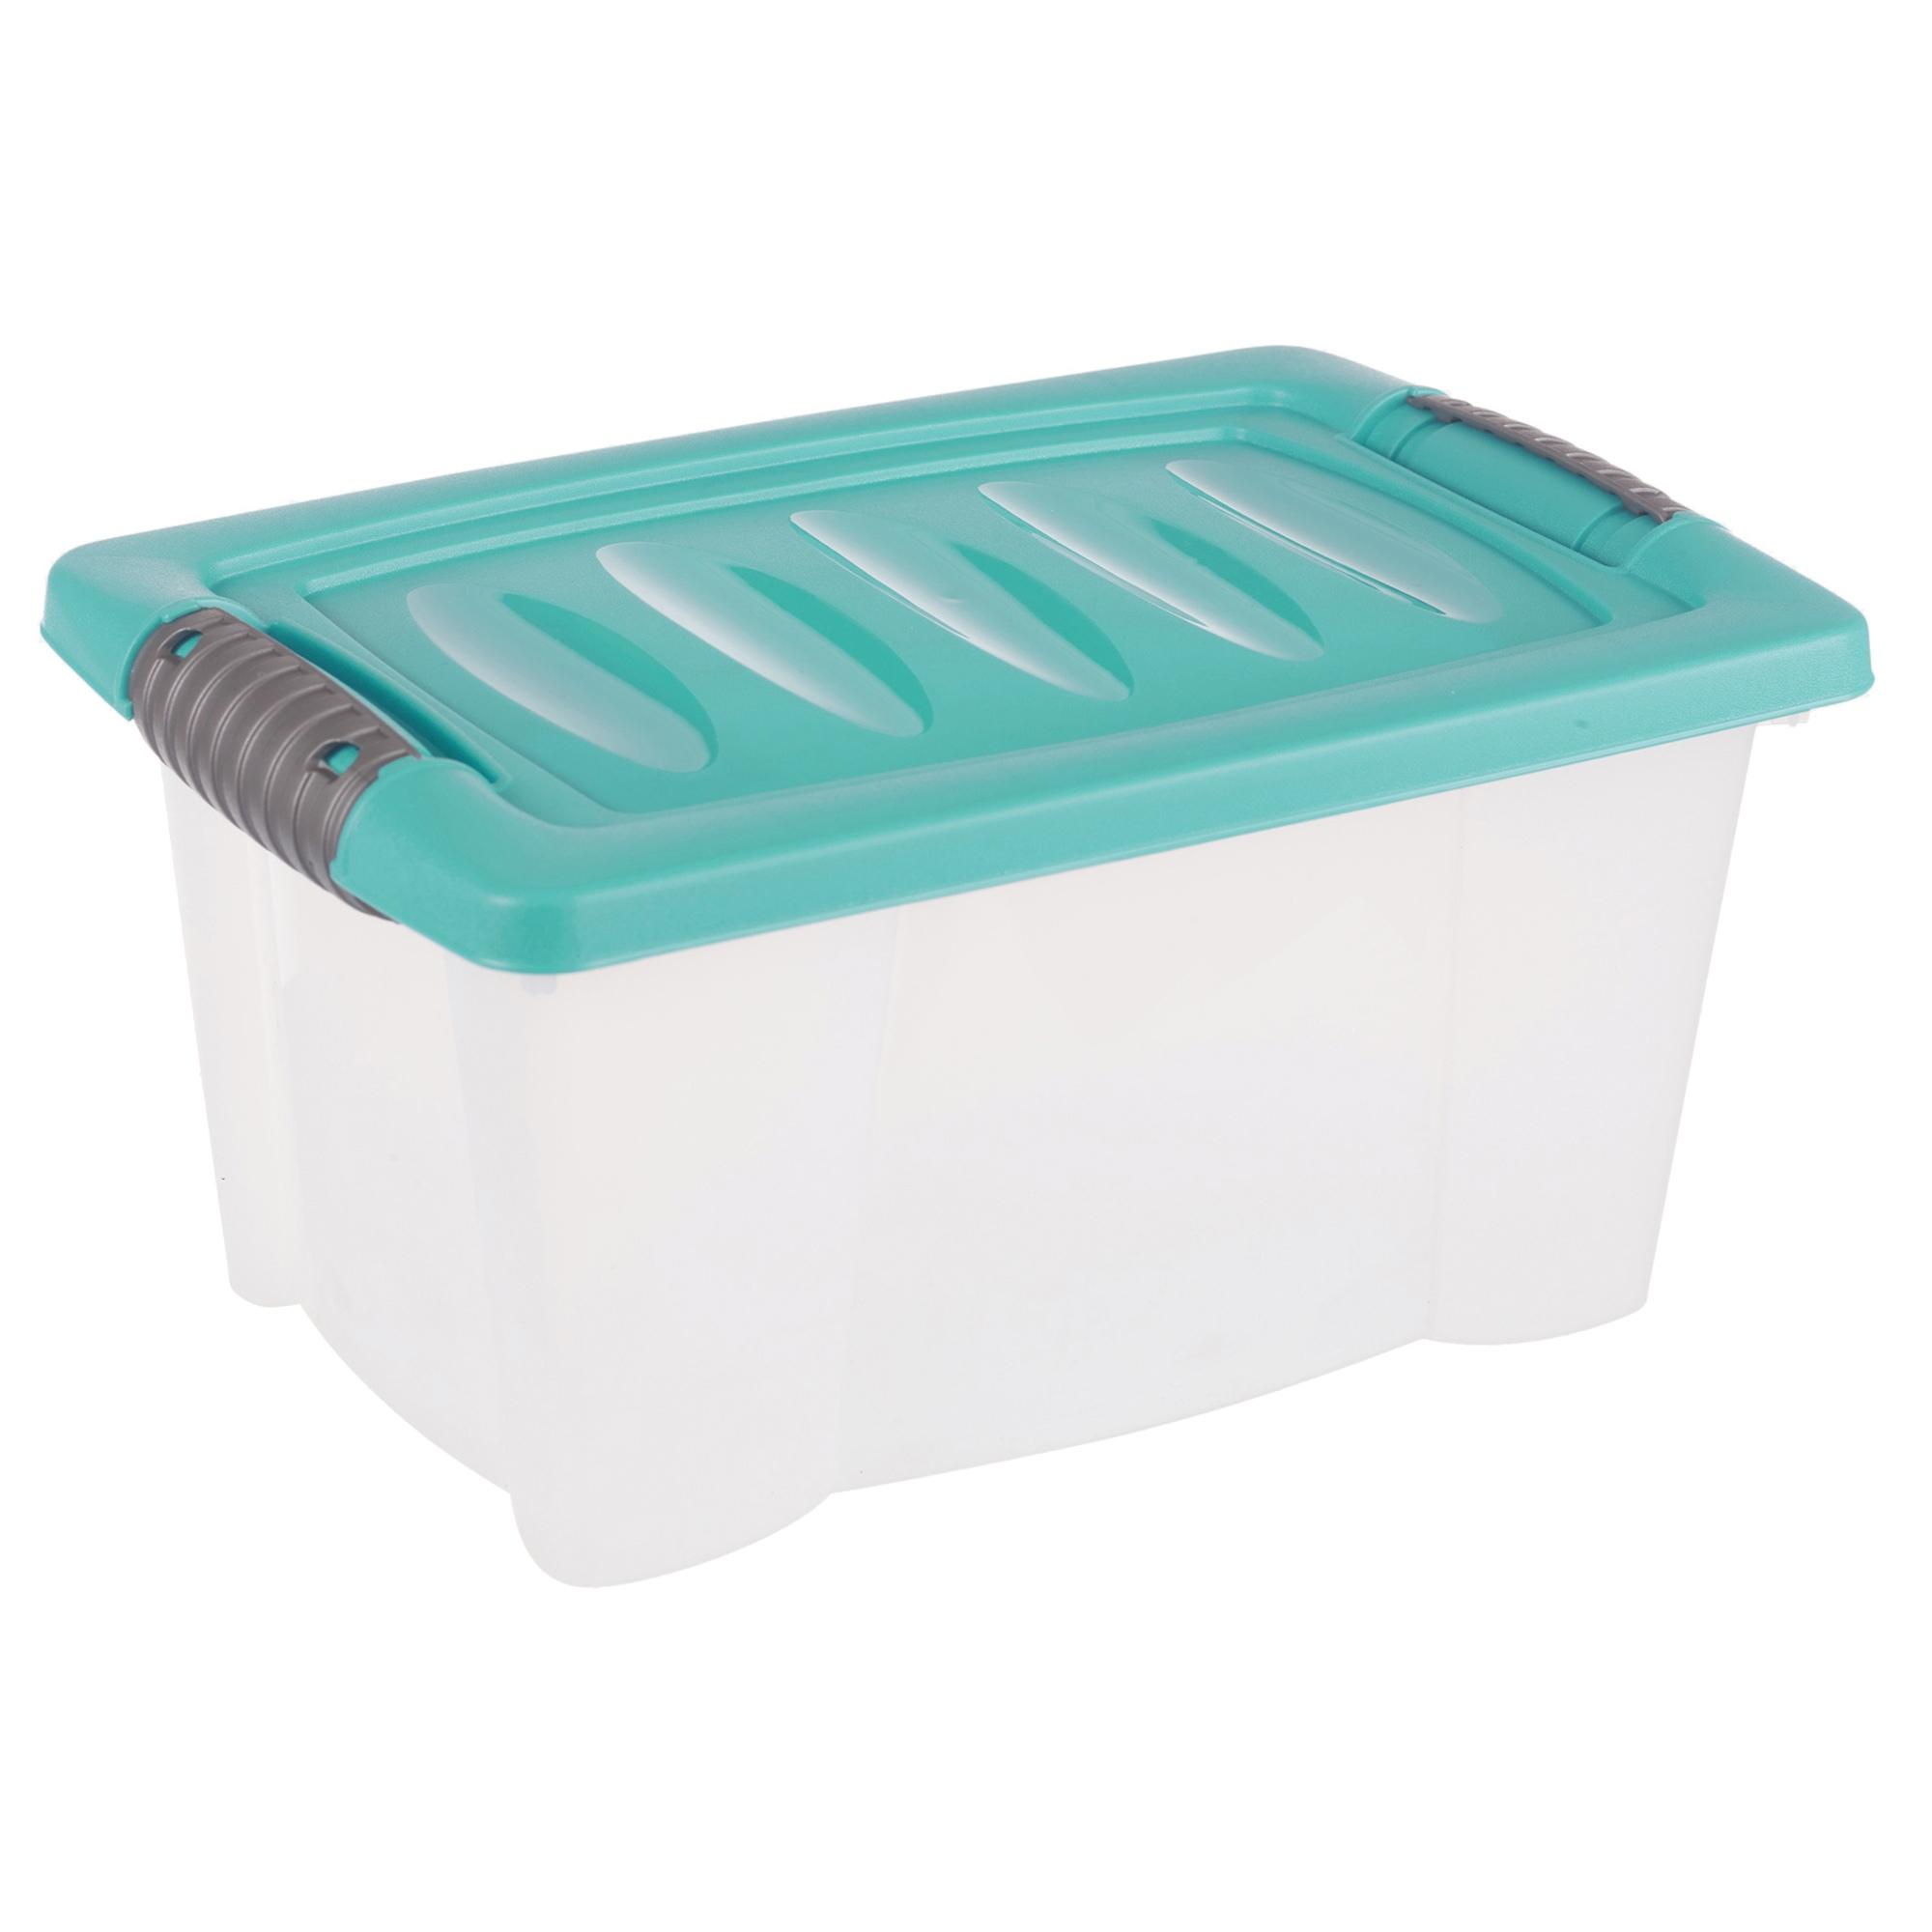 set of 3 small plastic storage boxes click lid desktop shelf container tubs home ebay. Black Bedroom Furniture Sets. Home Design Ideas